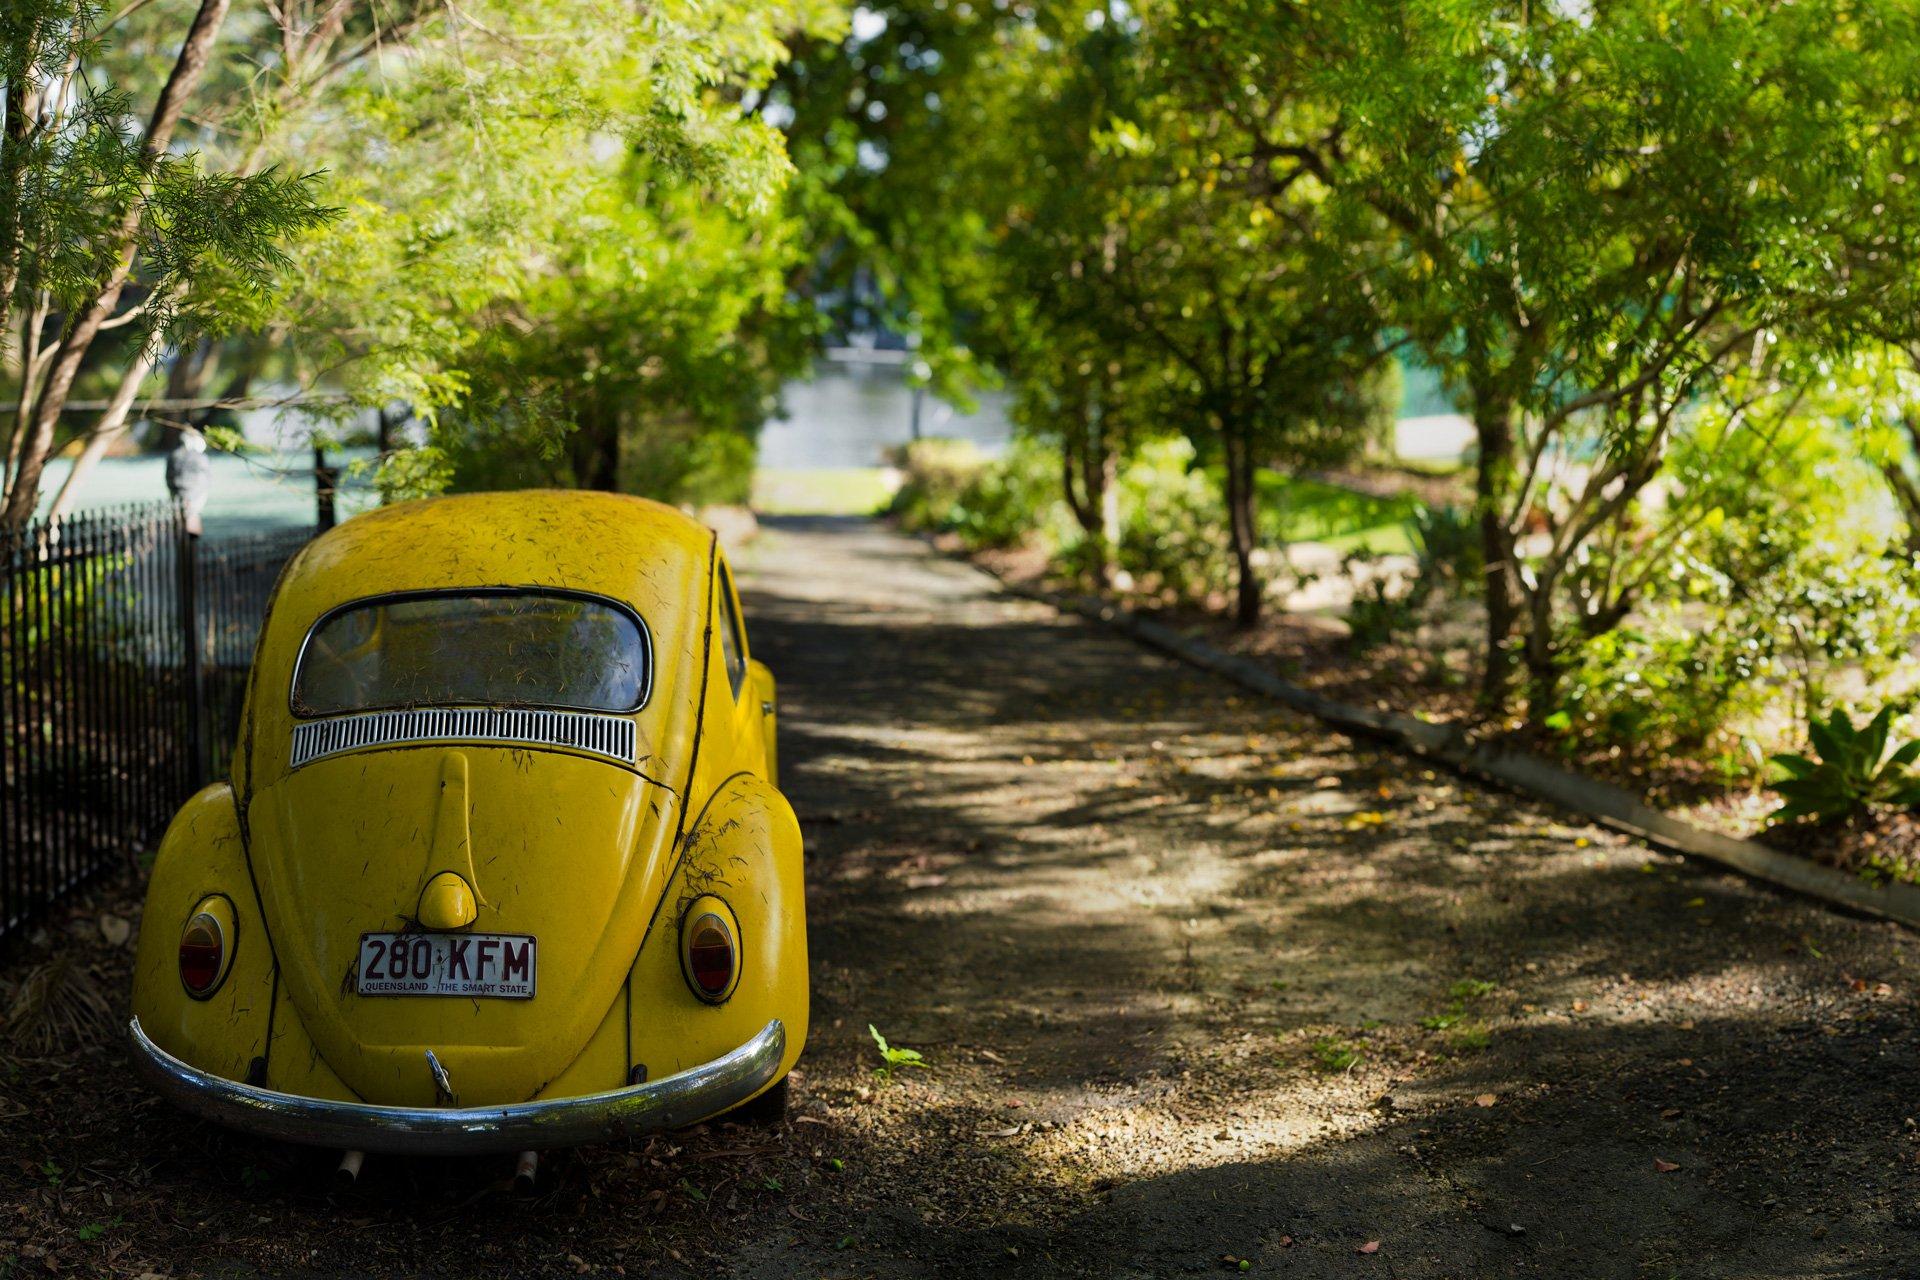 3840x1080 Wallpaper Classic Car Volkswagen Beetle Hd Duvar Kağıdı Arka Plan 1920x1280